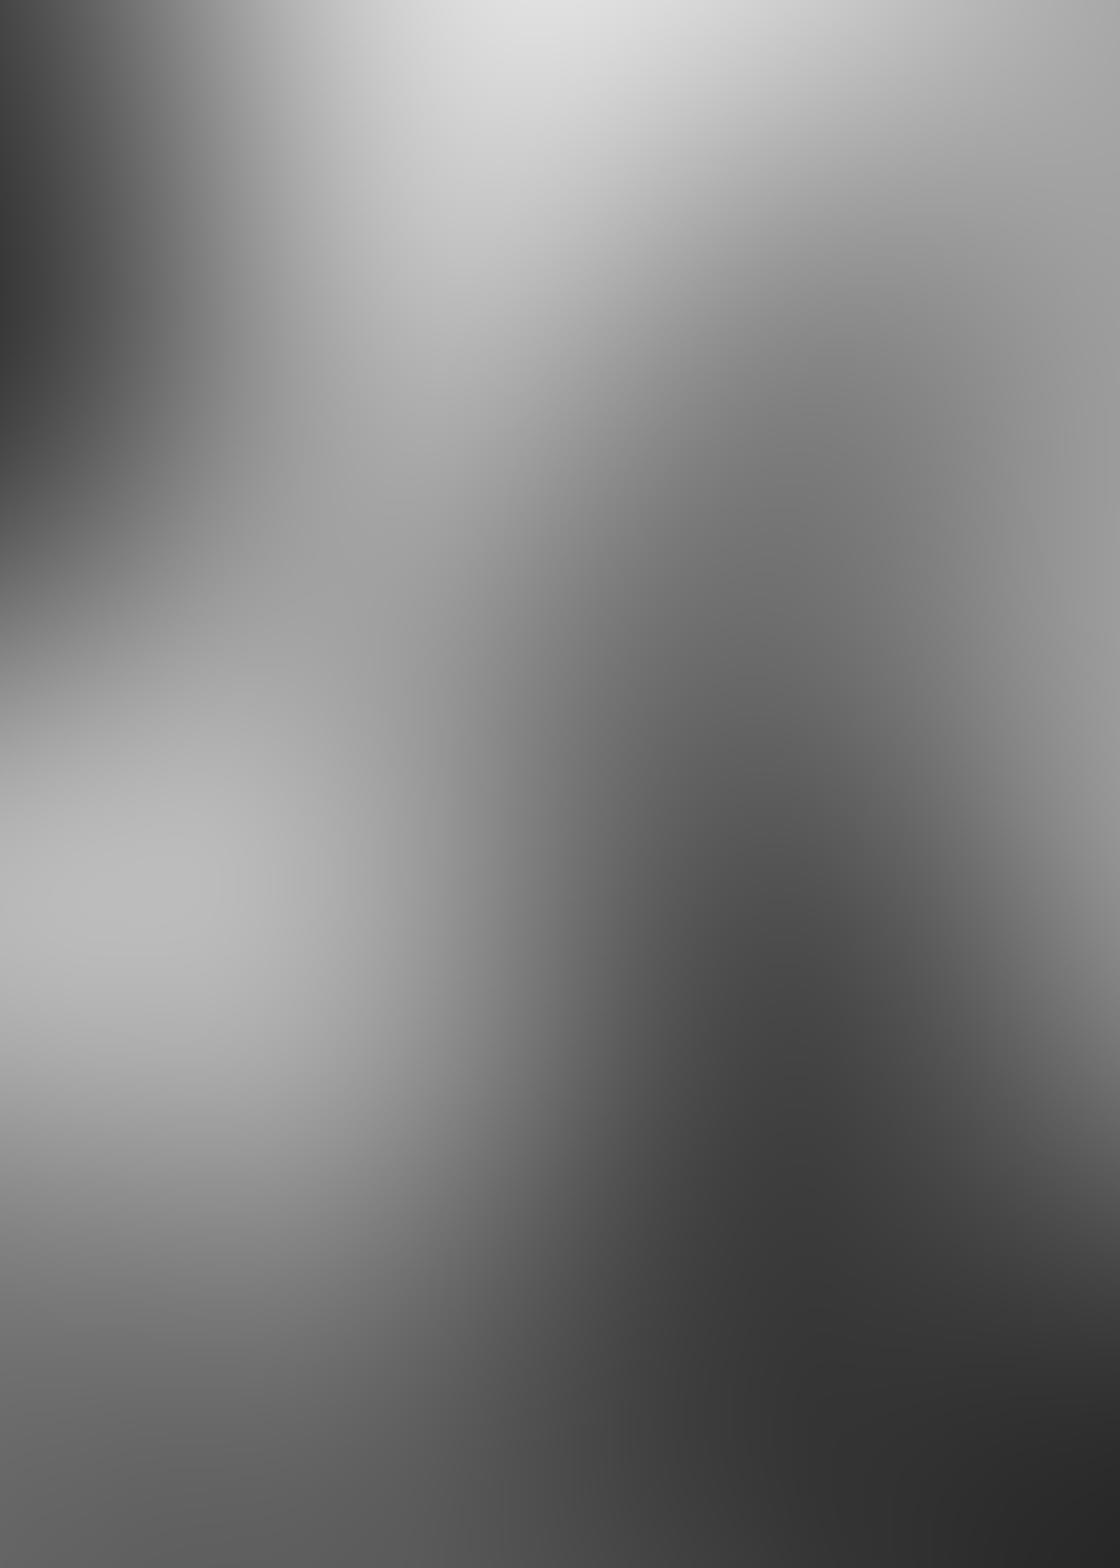 Black & White iPhone Portrait Photos 13